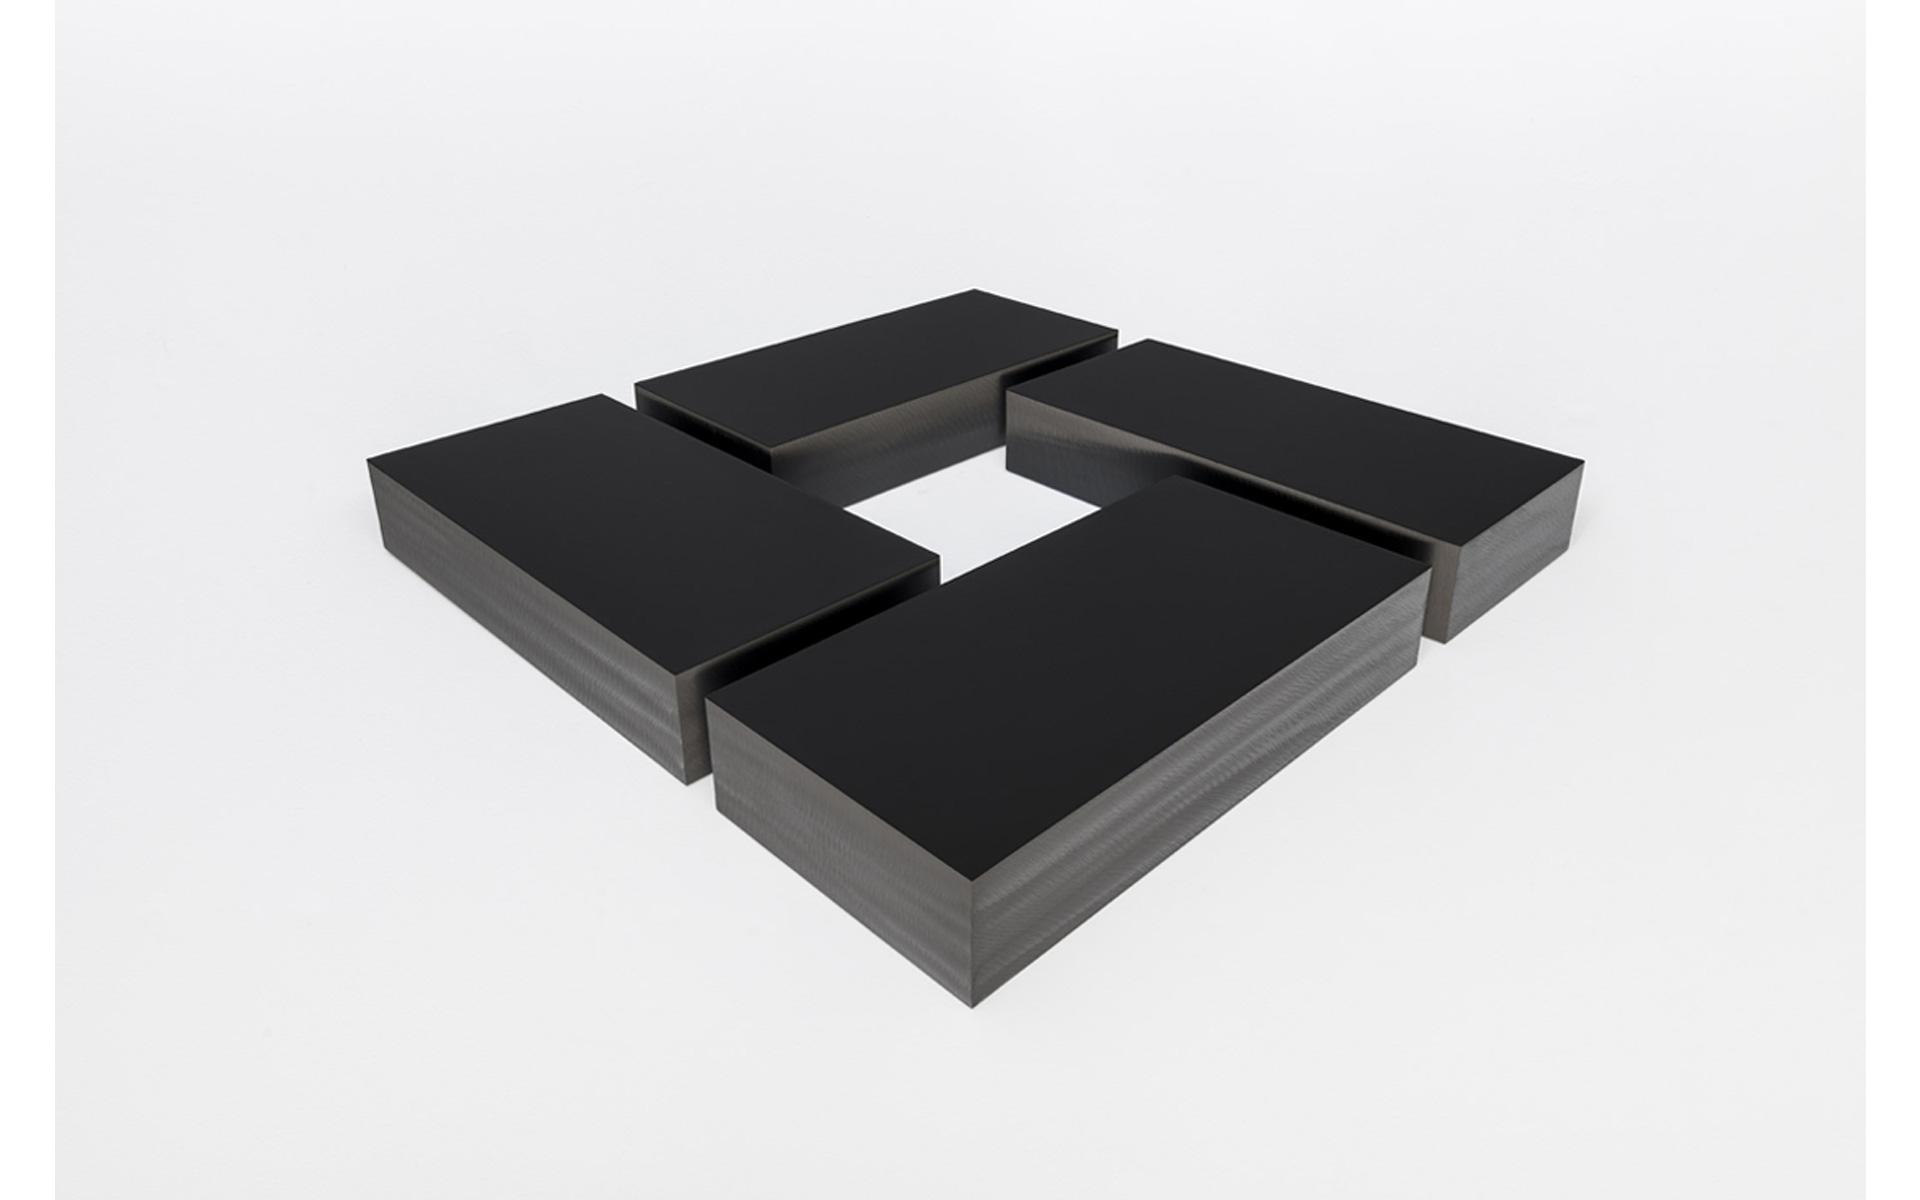 RANK, 2020 Acrylic on steel, 60.5 × 100 × 9 cm / Galeria Raquel Arnaud - Photo: Ding Musa